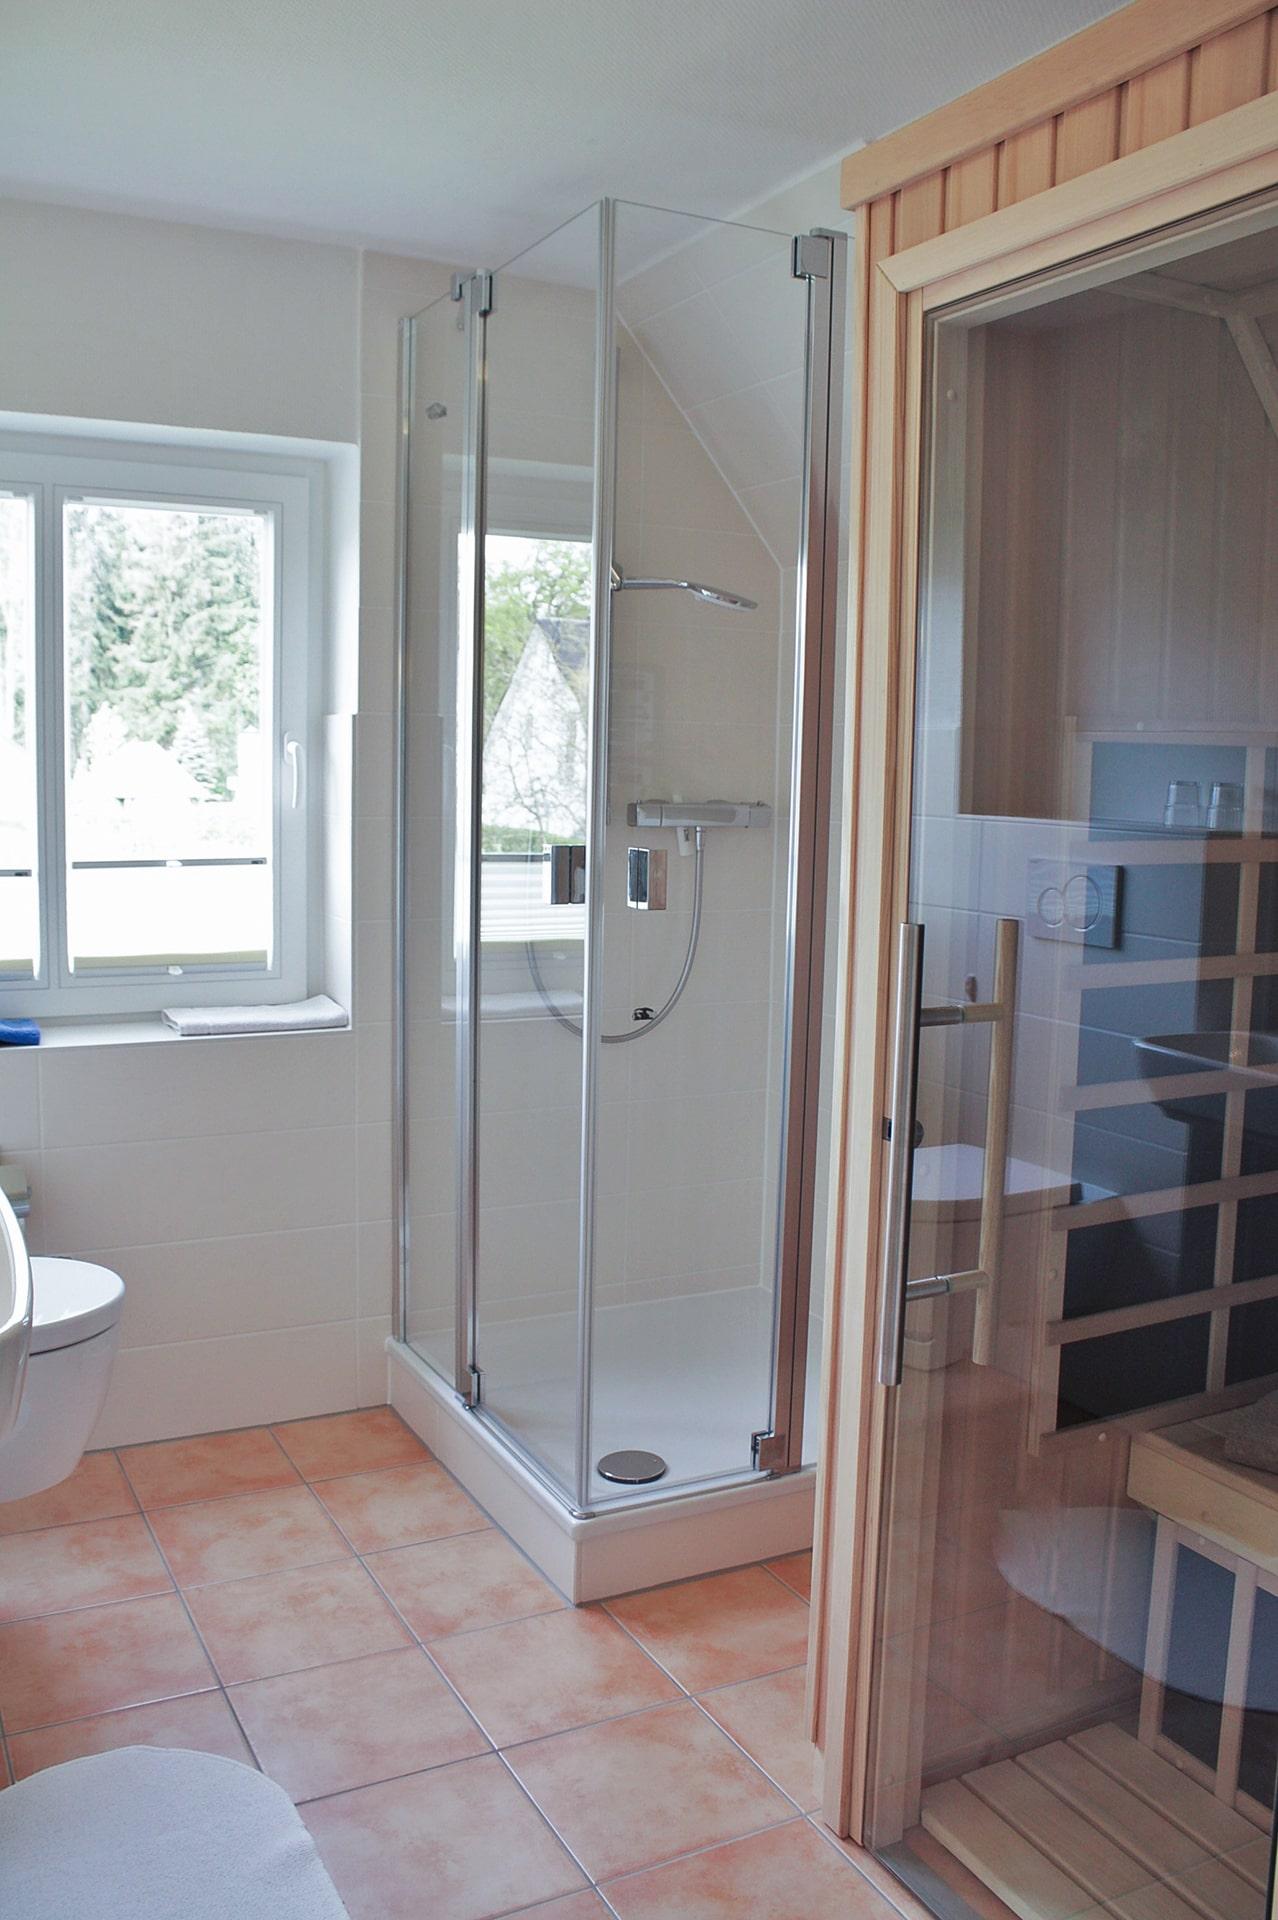 malerhaus-kuhse-ferienwohnung-südwind-bad-infrarot-sauna